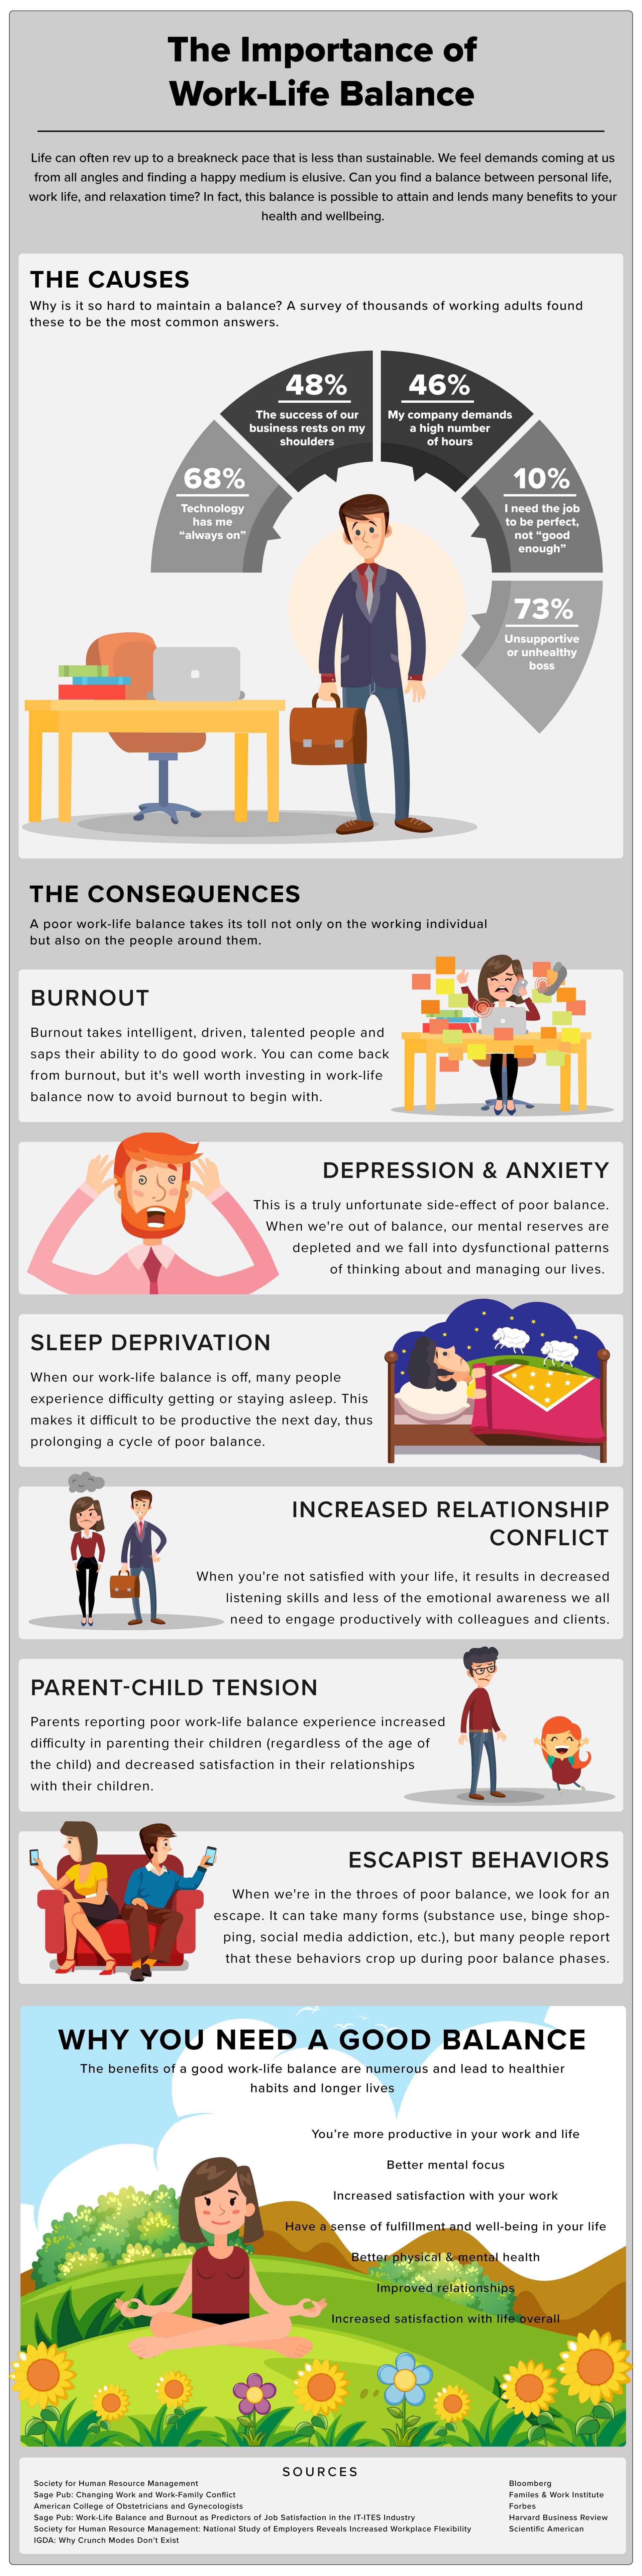 Work-life balance infographic